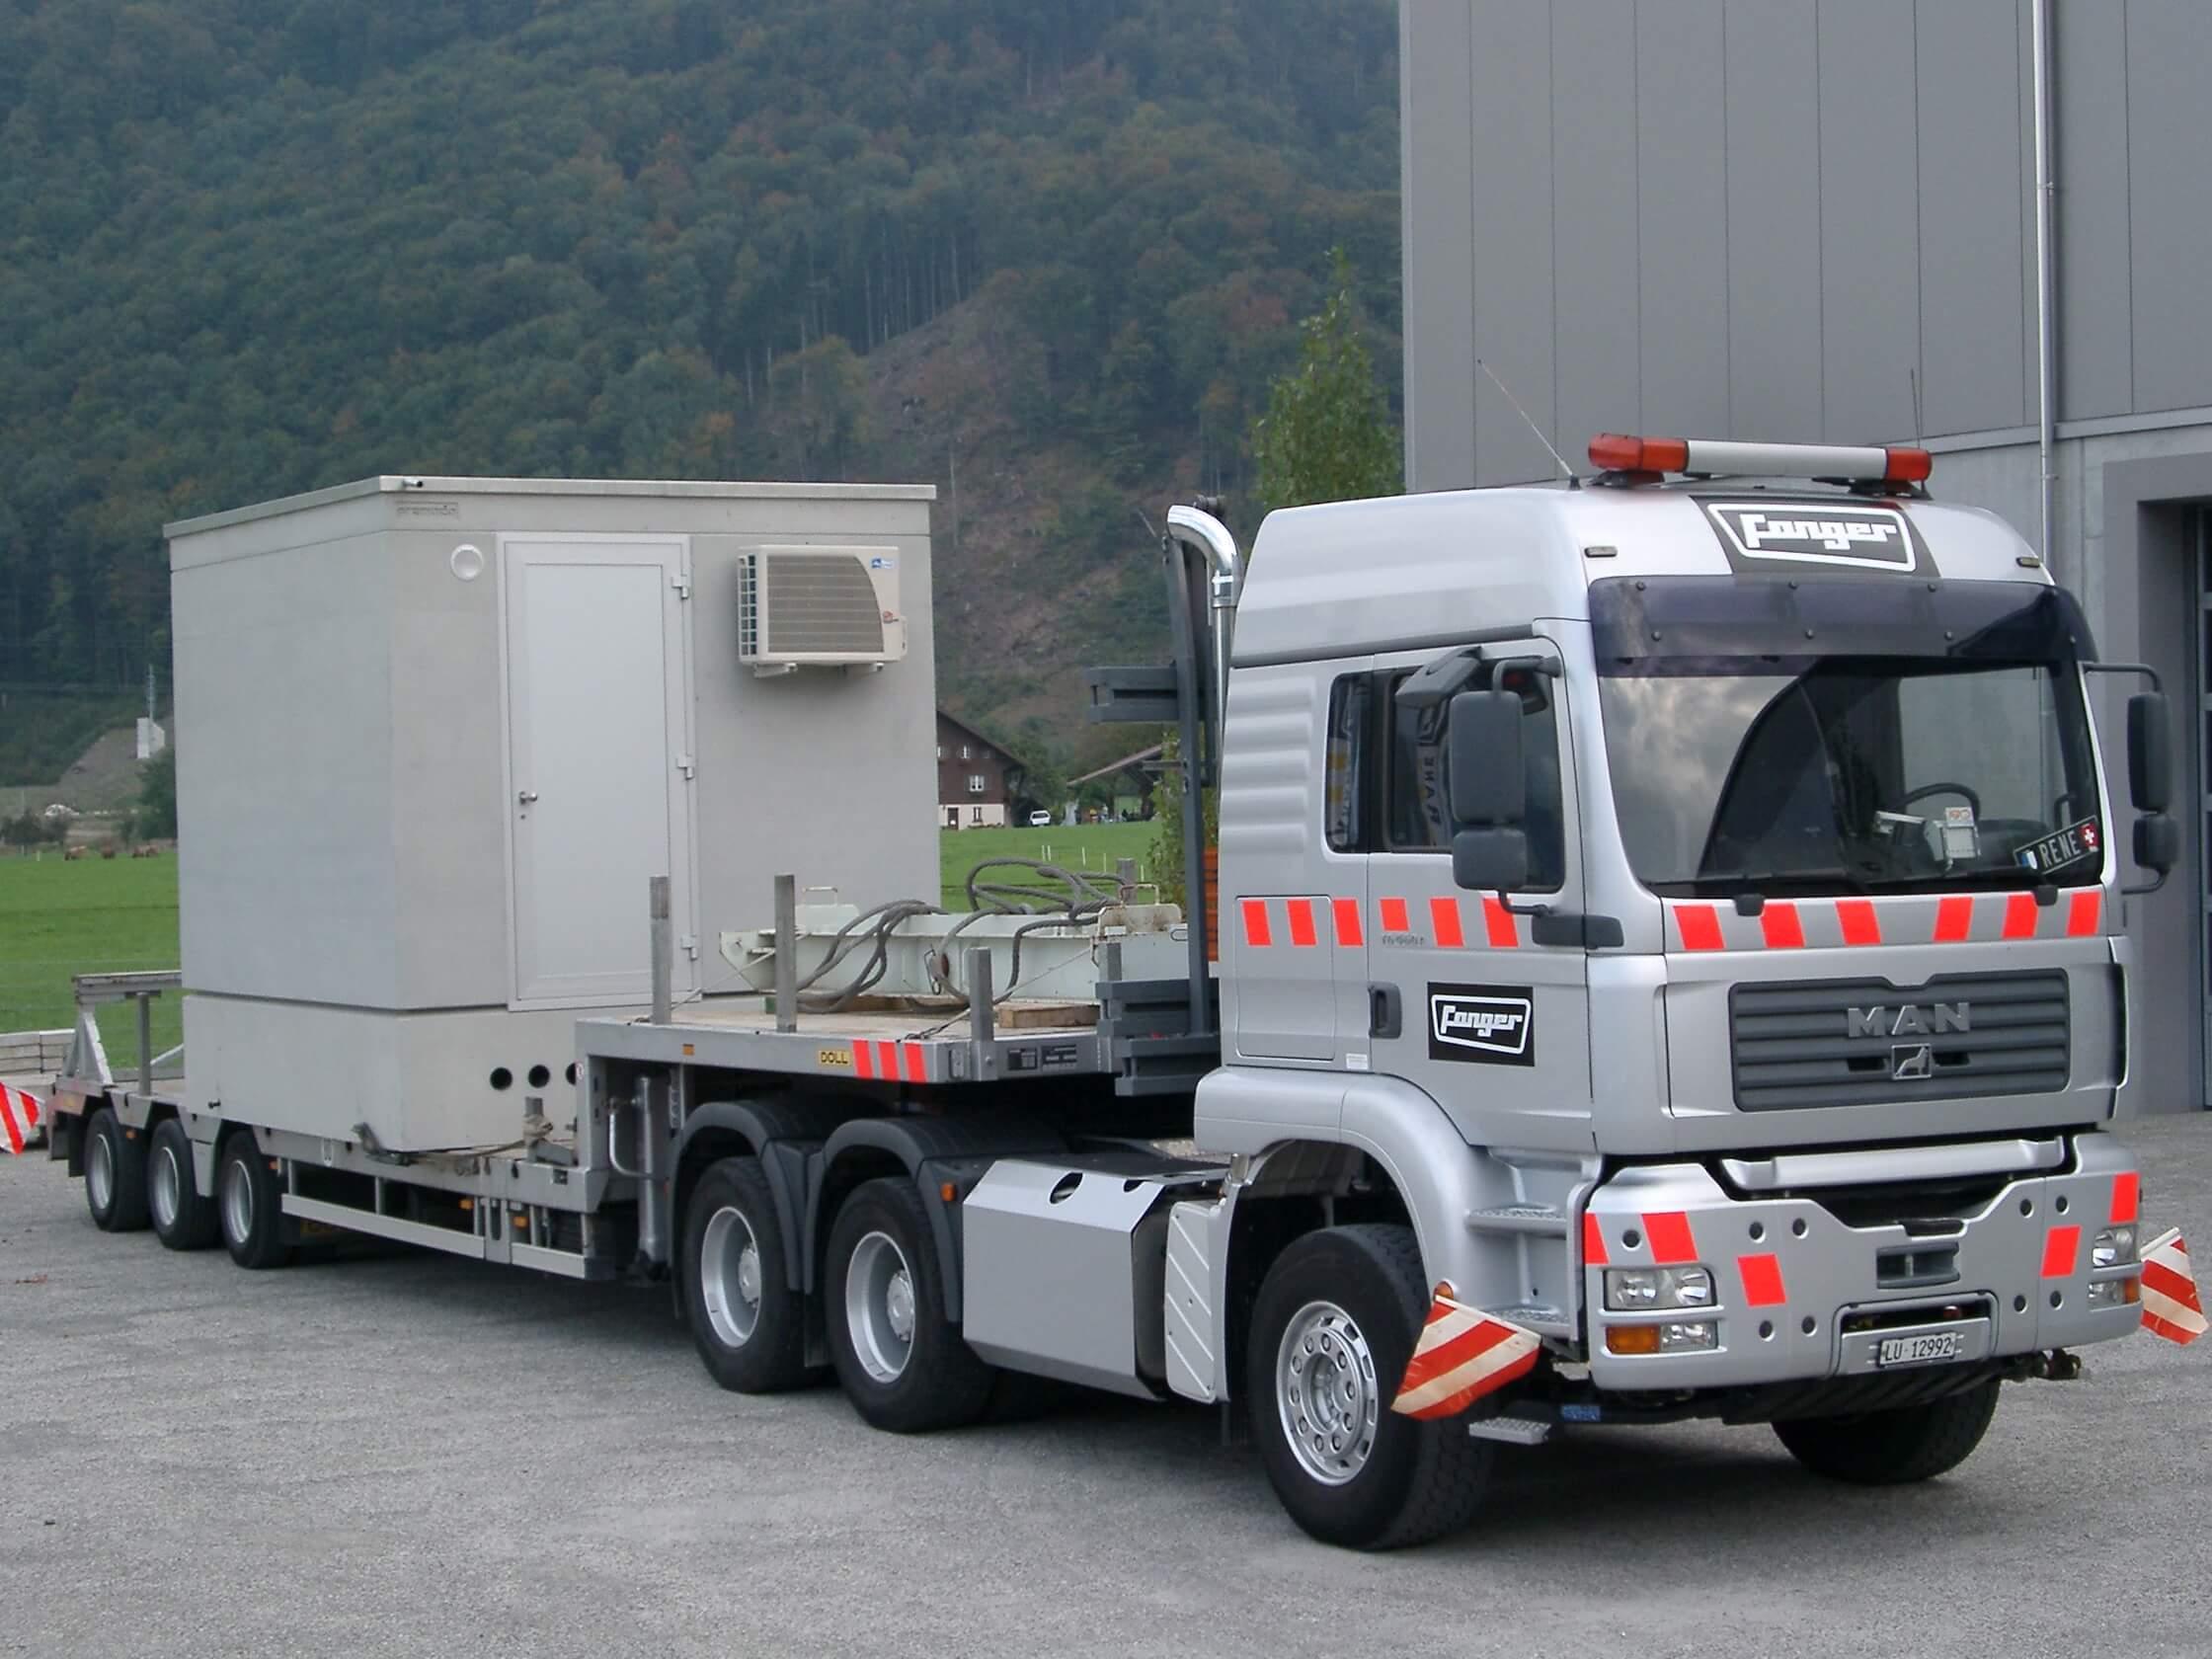 Technikkabine SBB Buchrain 077